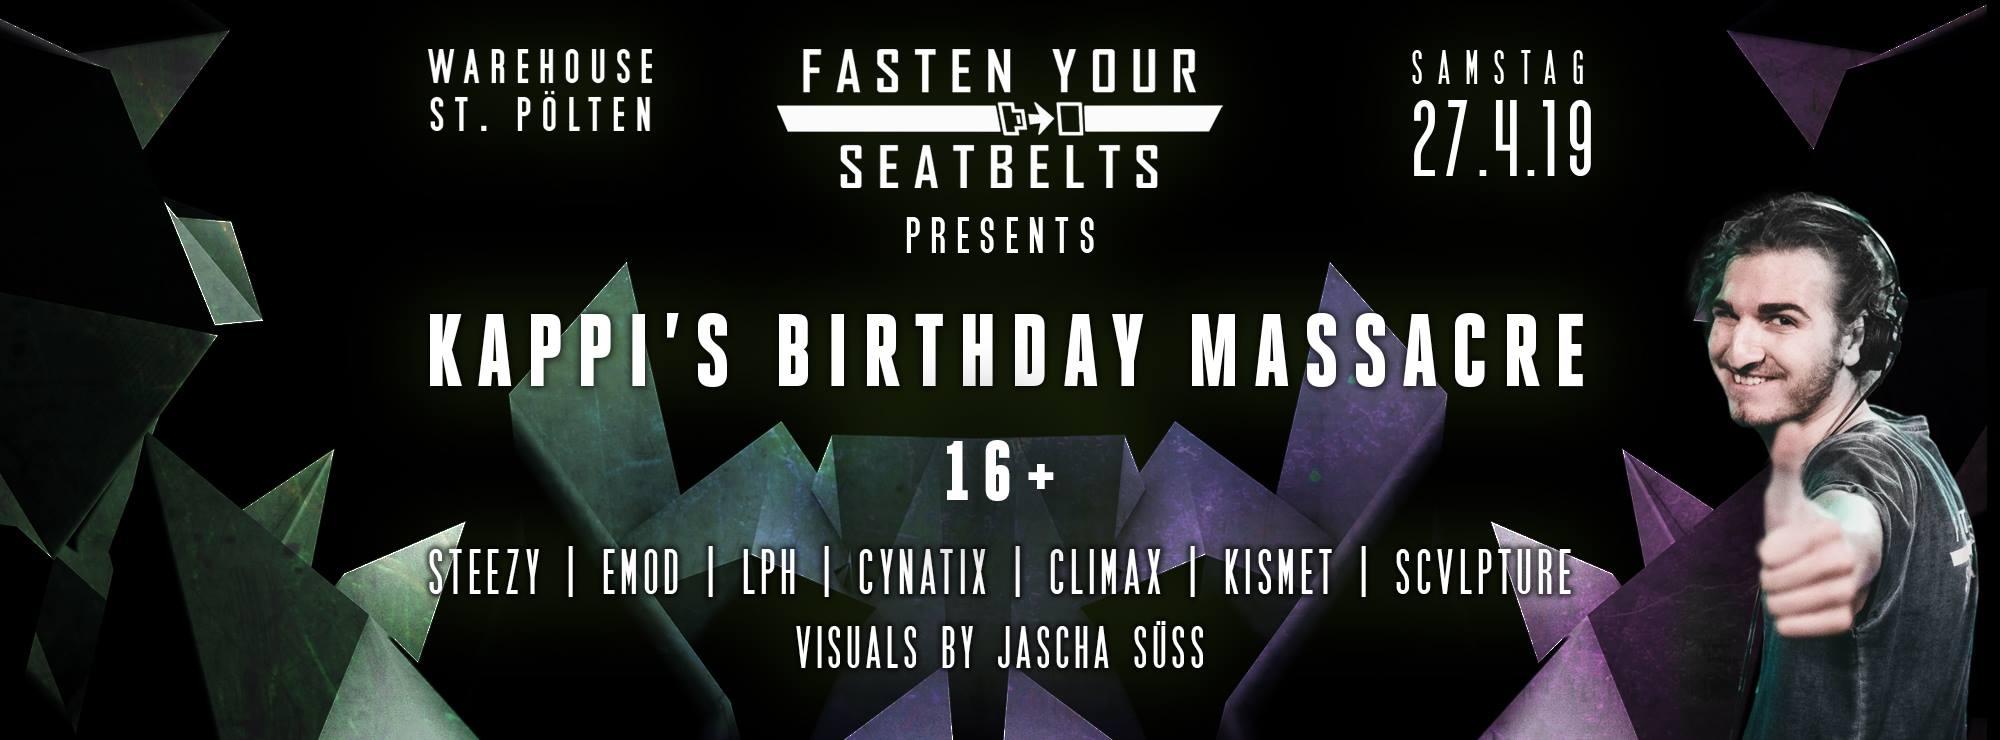 Fasten Your Seatbelts – Kappi's Birthday Massacre